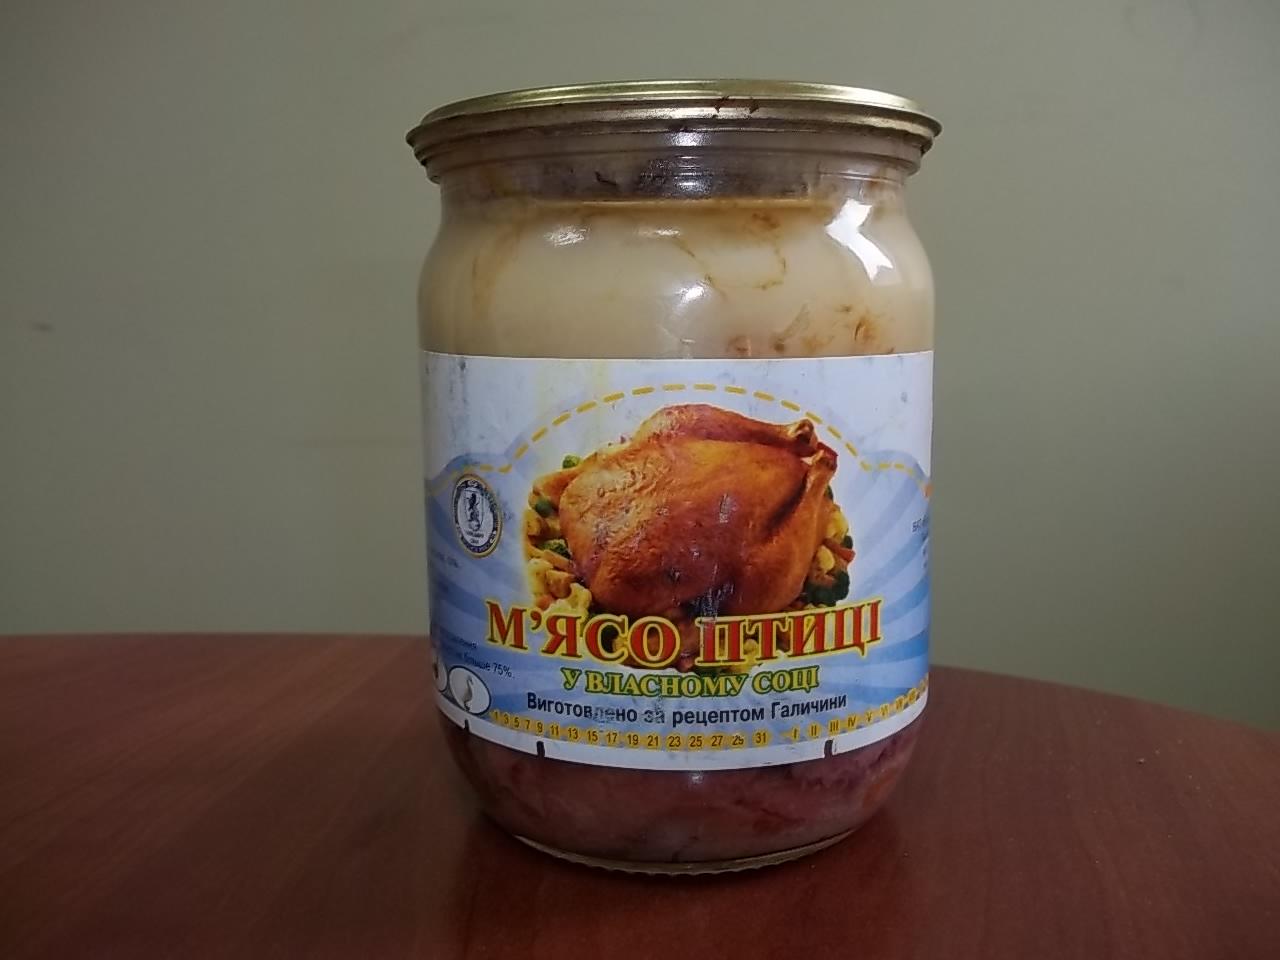 Тушенка из гуся в домашних условиях рецепт